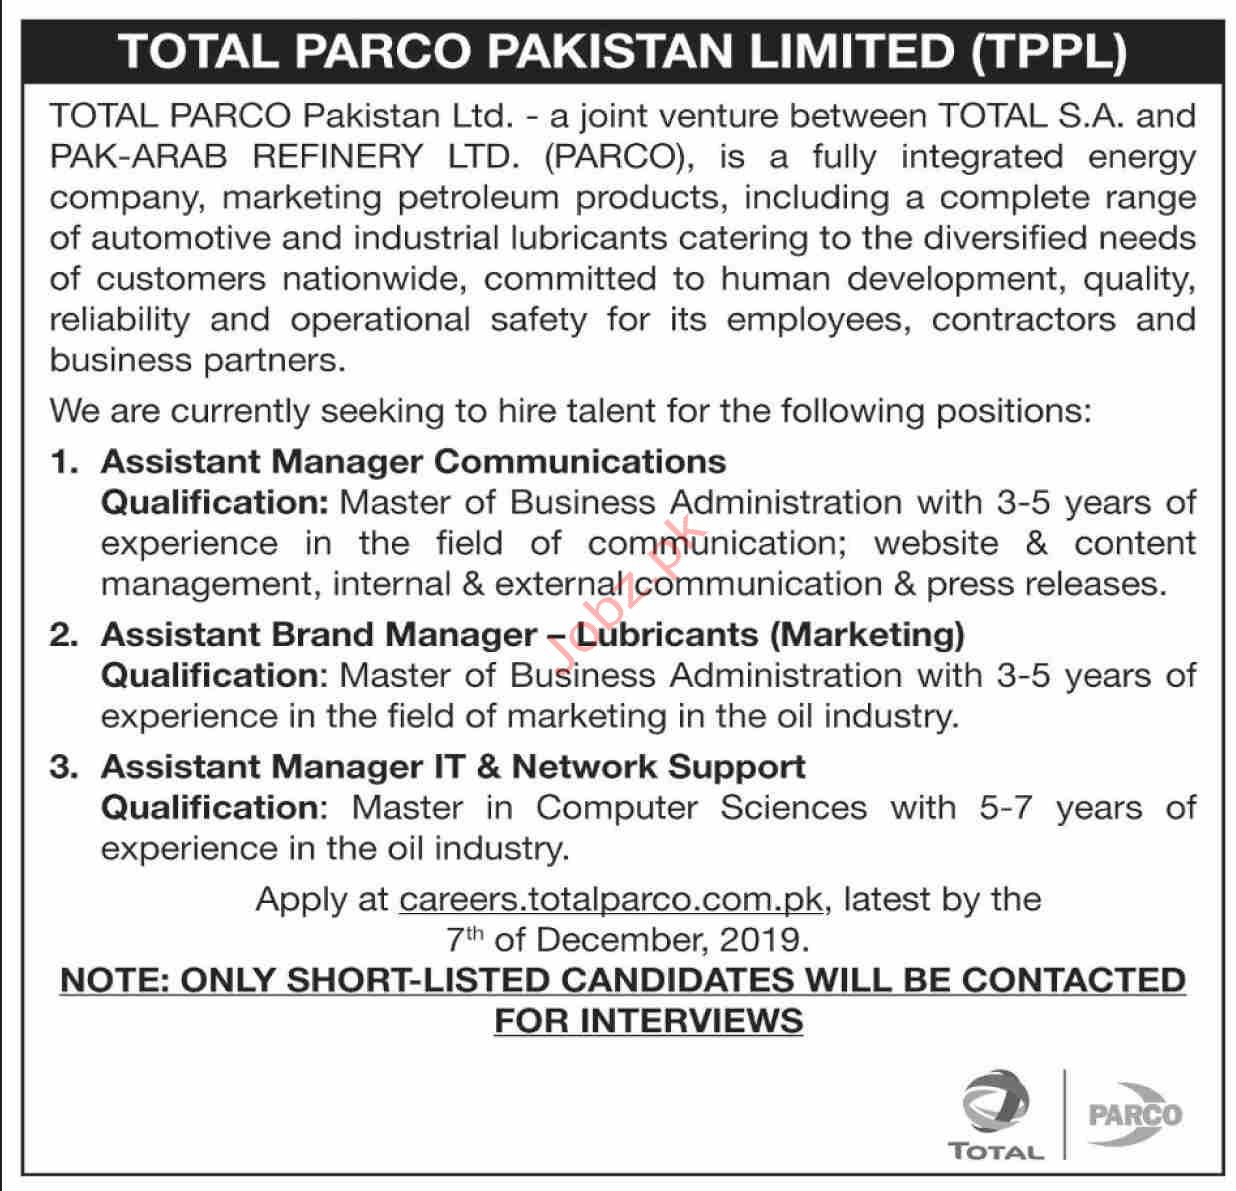 Total PARCO Pakistan Limited TPPL Karachi Jobs 2019